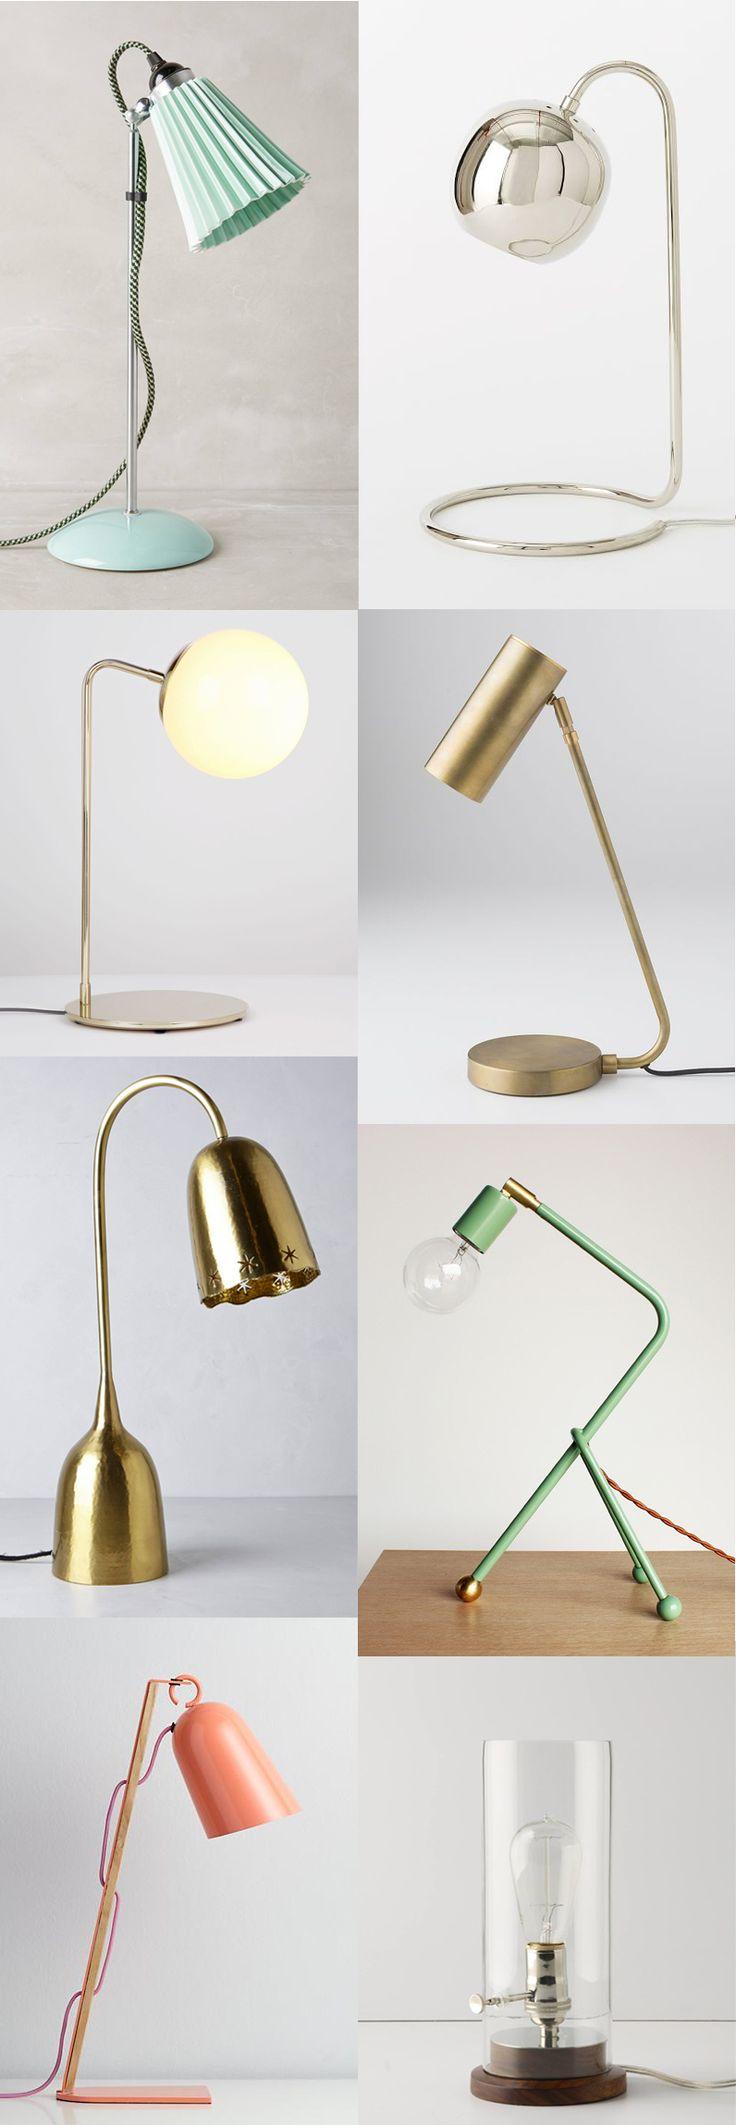 Best 25 Loft Lighting Ideas Only On Pinterest Auto Electrical Wiring Diagram Light